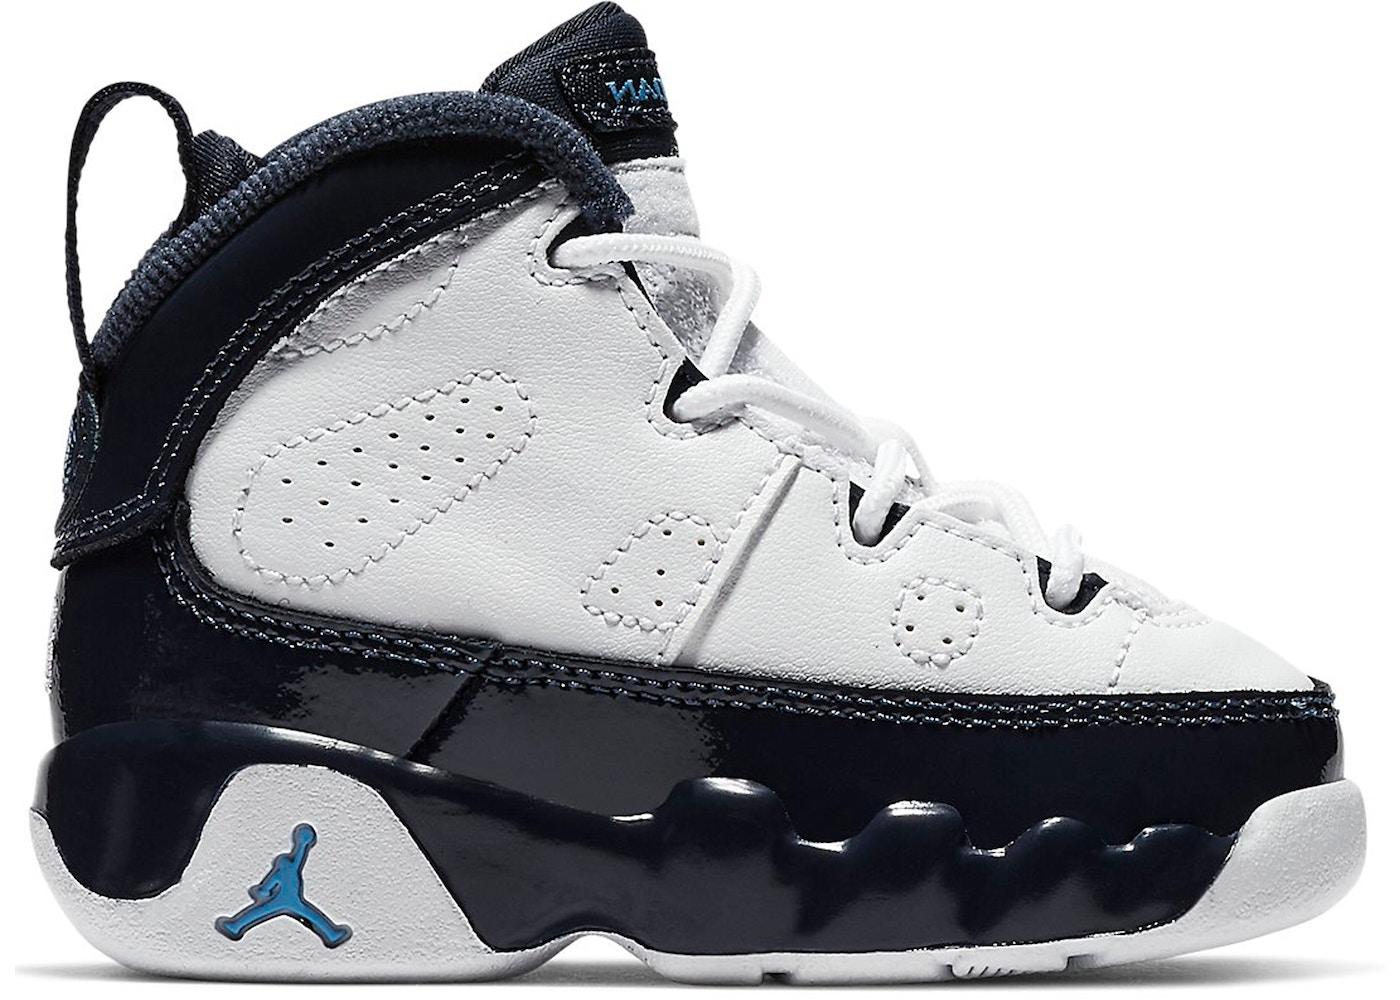 9df794e66bbba5 Air Jordan 9 Shoes - Release Date